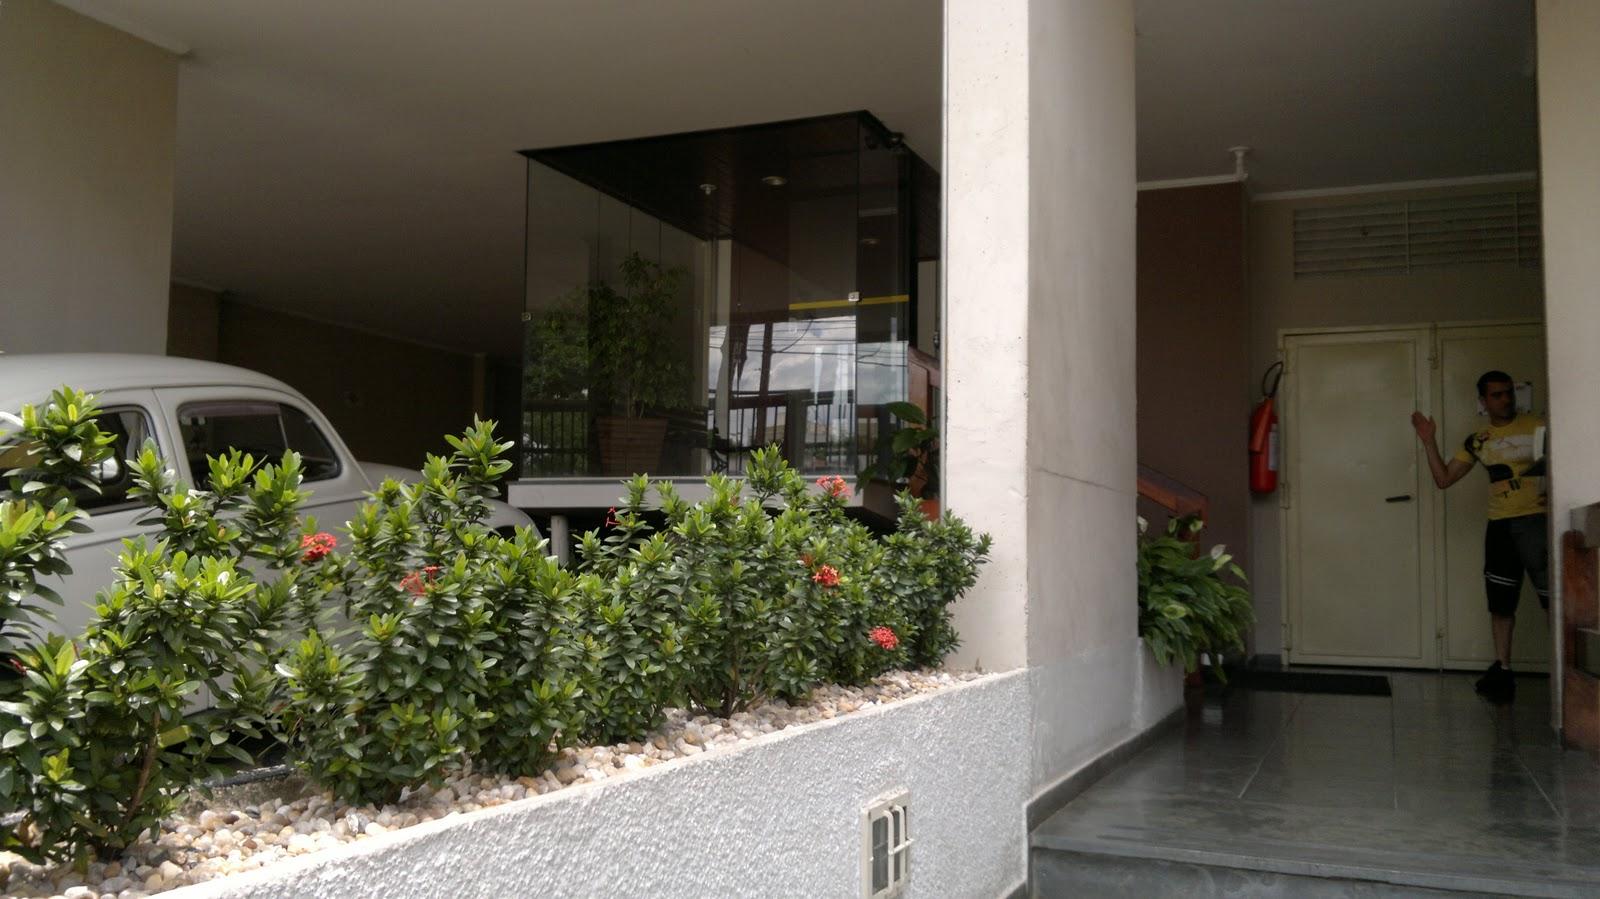 Edif cio aquidaban impermeabiliza o do piso no hall de - Entradas de pisos ...